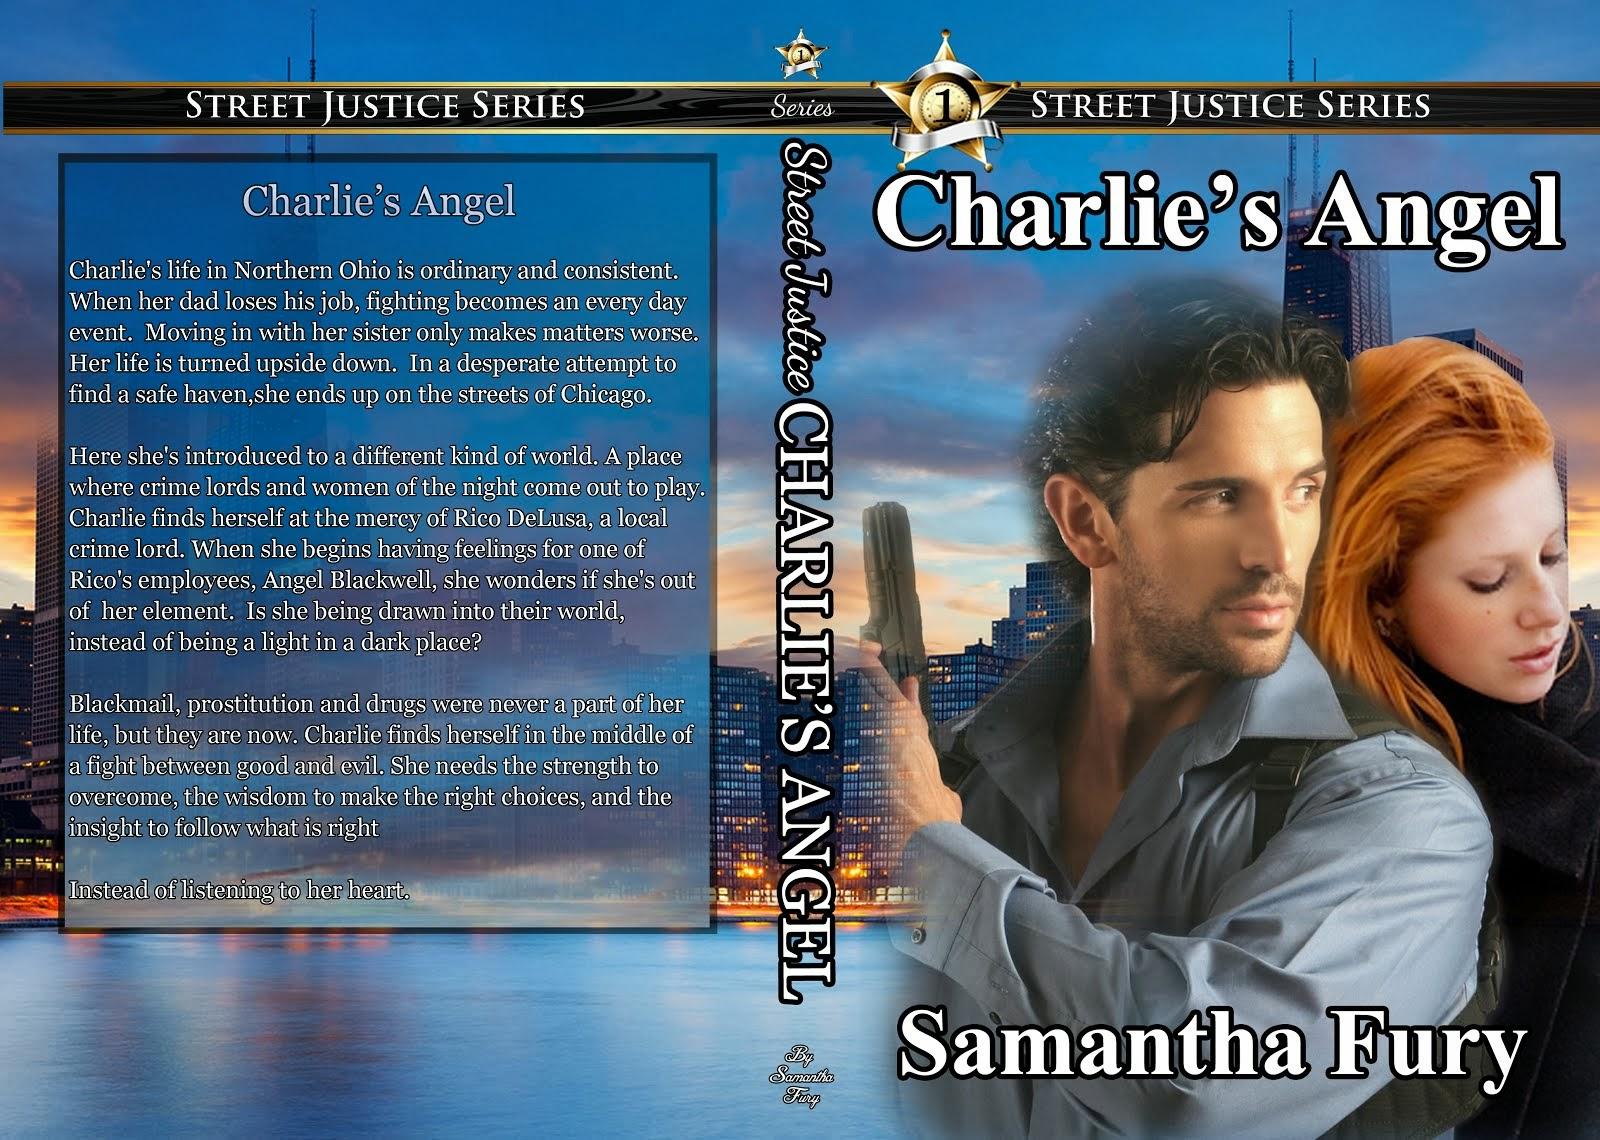 Street Justice . . . Charlie's Angel